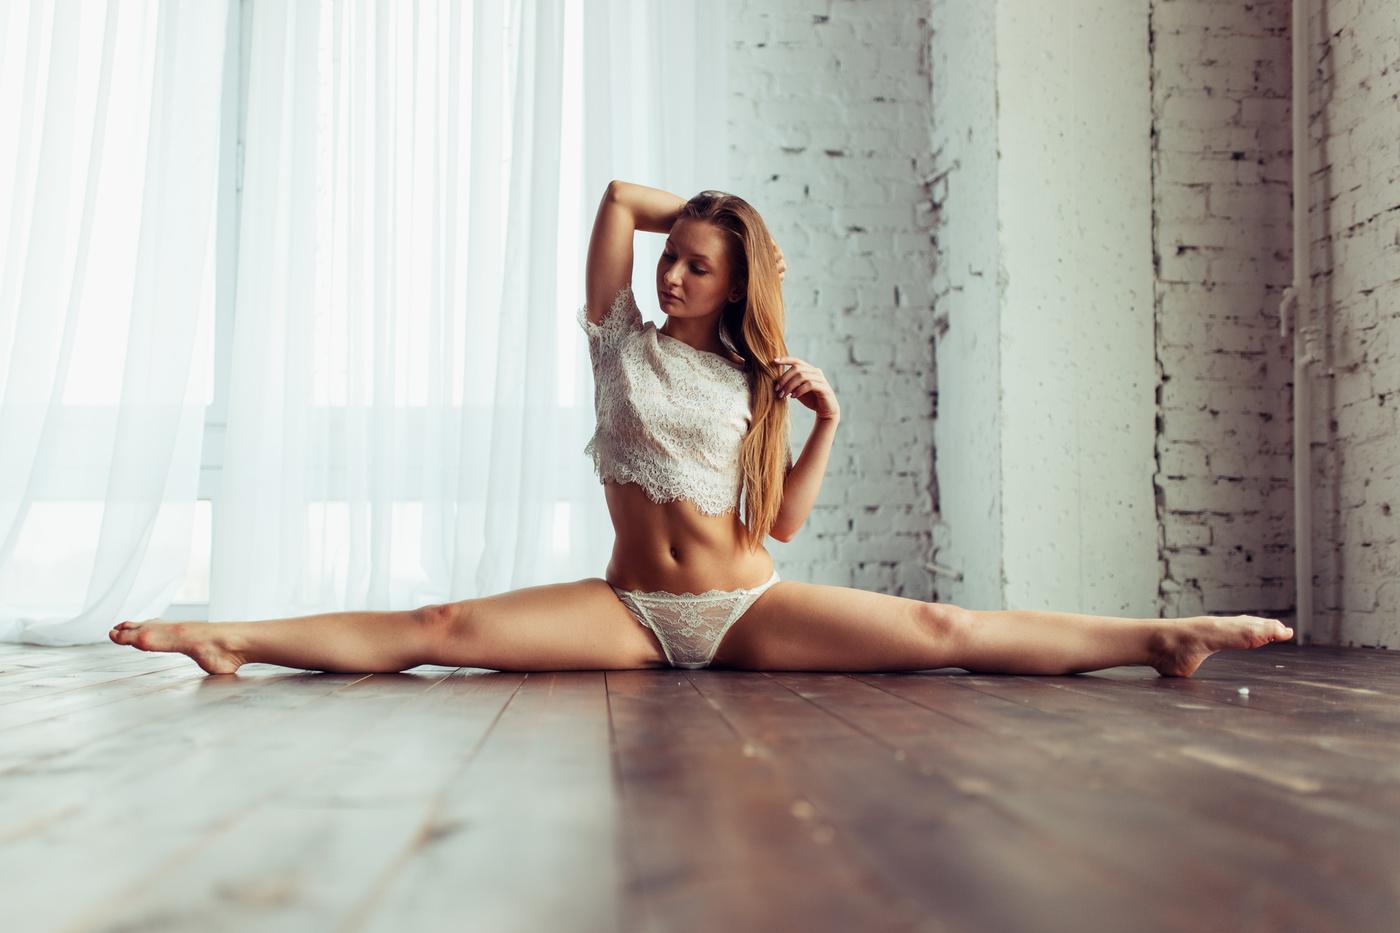 картинки голых девушек на шпагате - 6